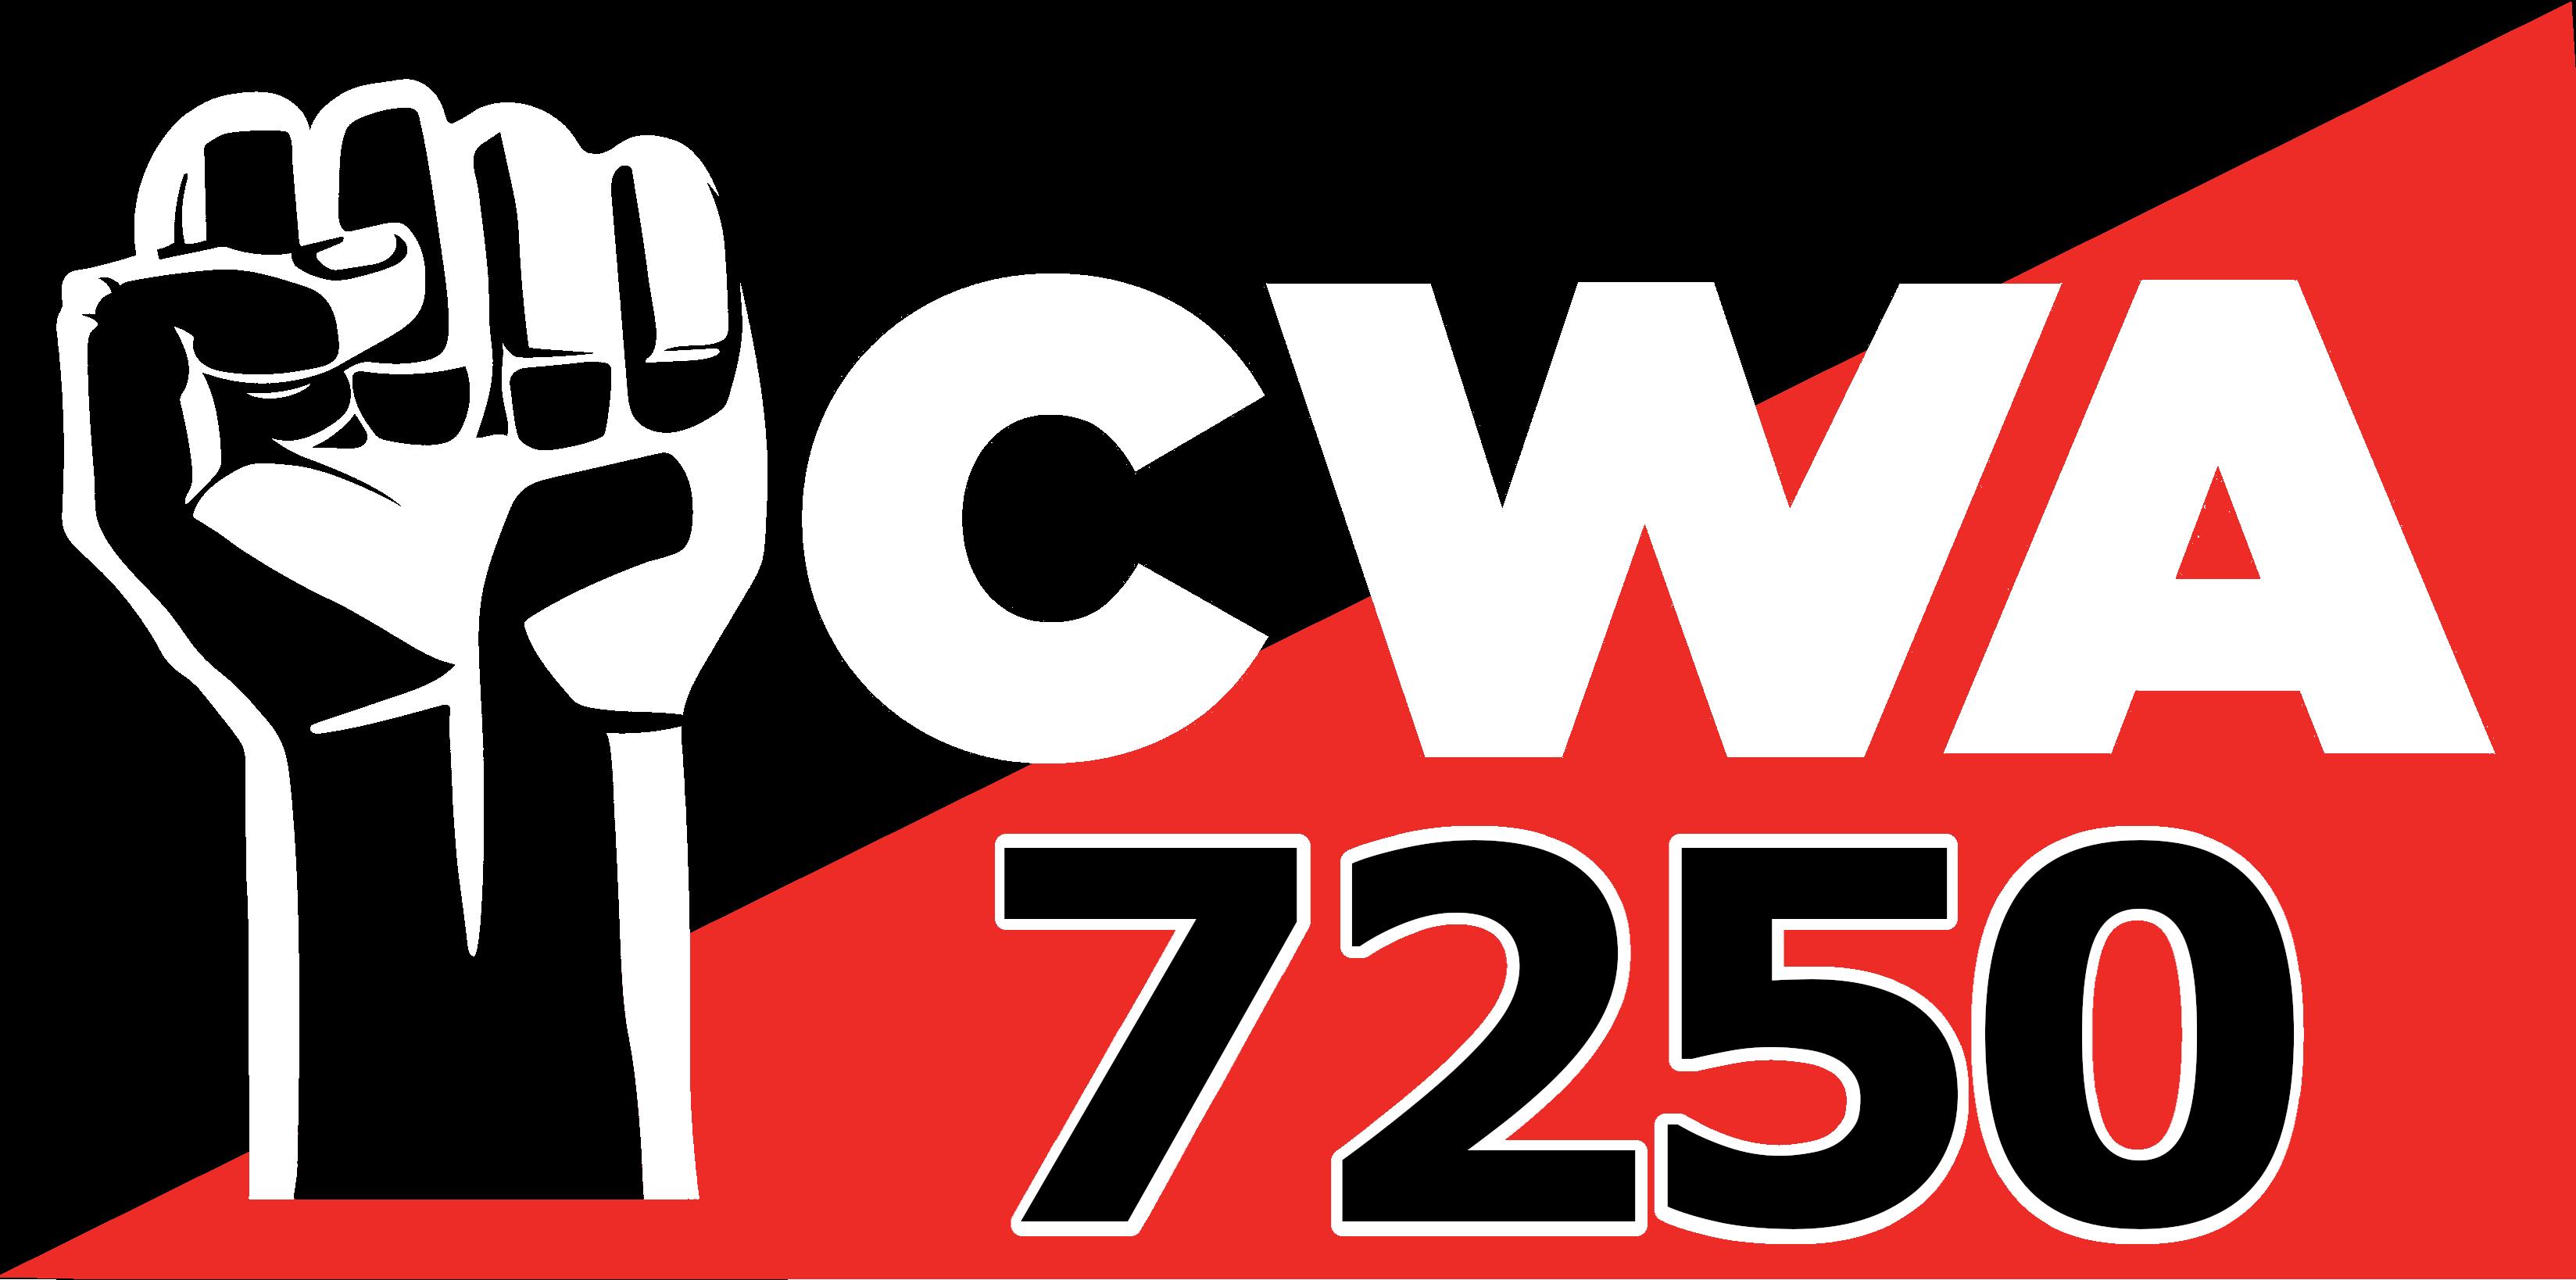 CWA Local 7250